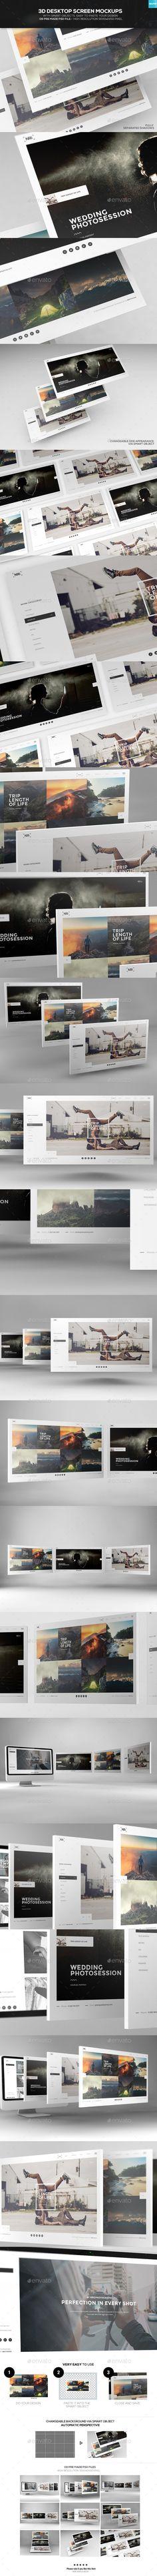 3D Desktop Screen Mockups  #themeforest • Click here to download ! http://graphicriver.net/item/3d-desktop-screen-mockups/7092445?ref=pxcr